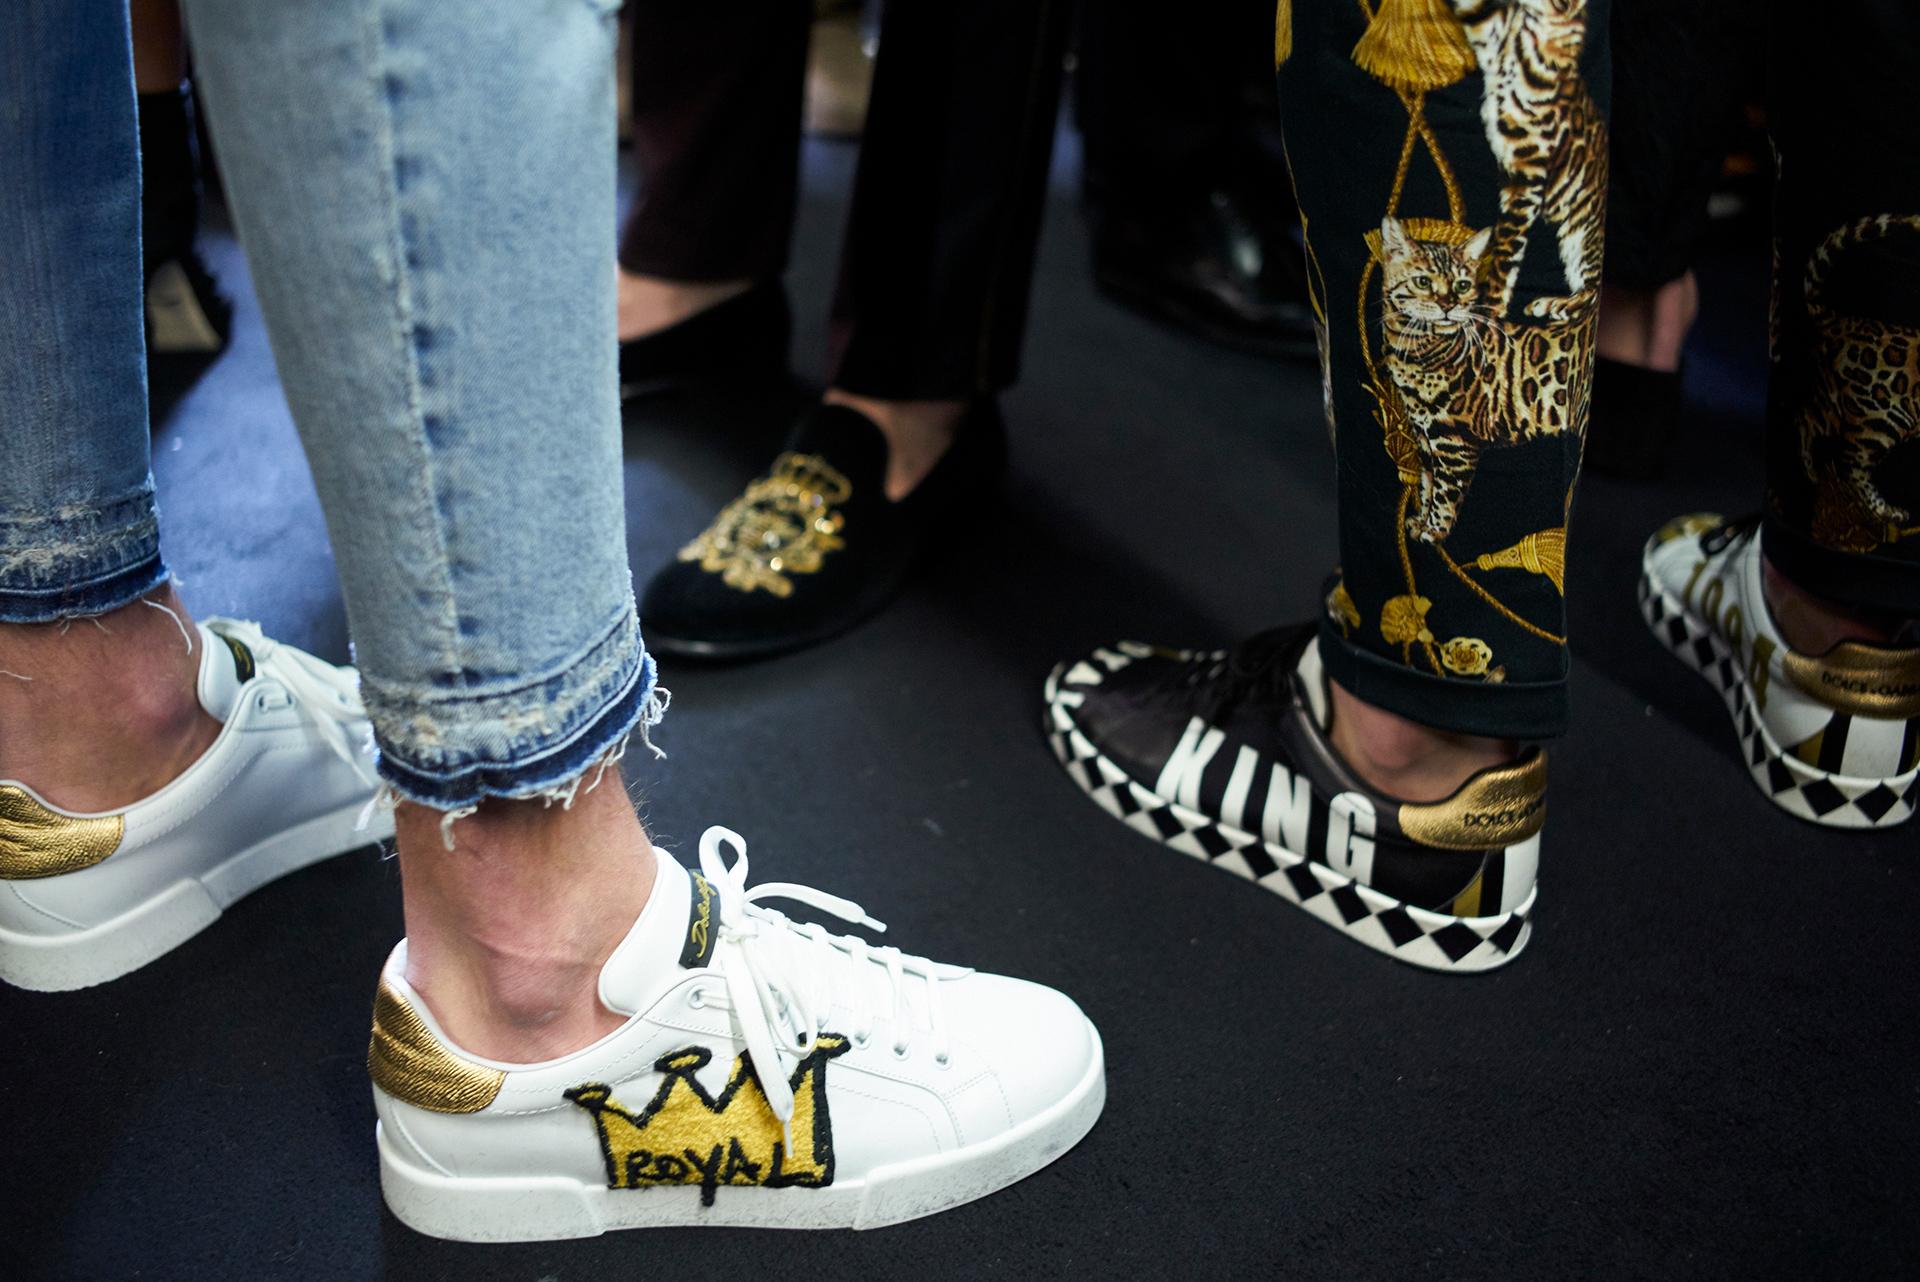 paire de chaussure dolce gabbana,chaussures dolce gabbana